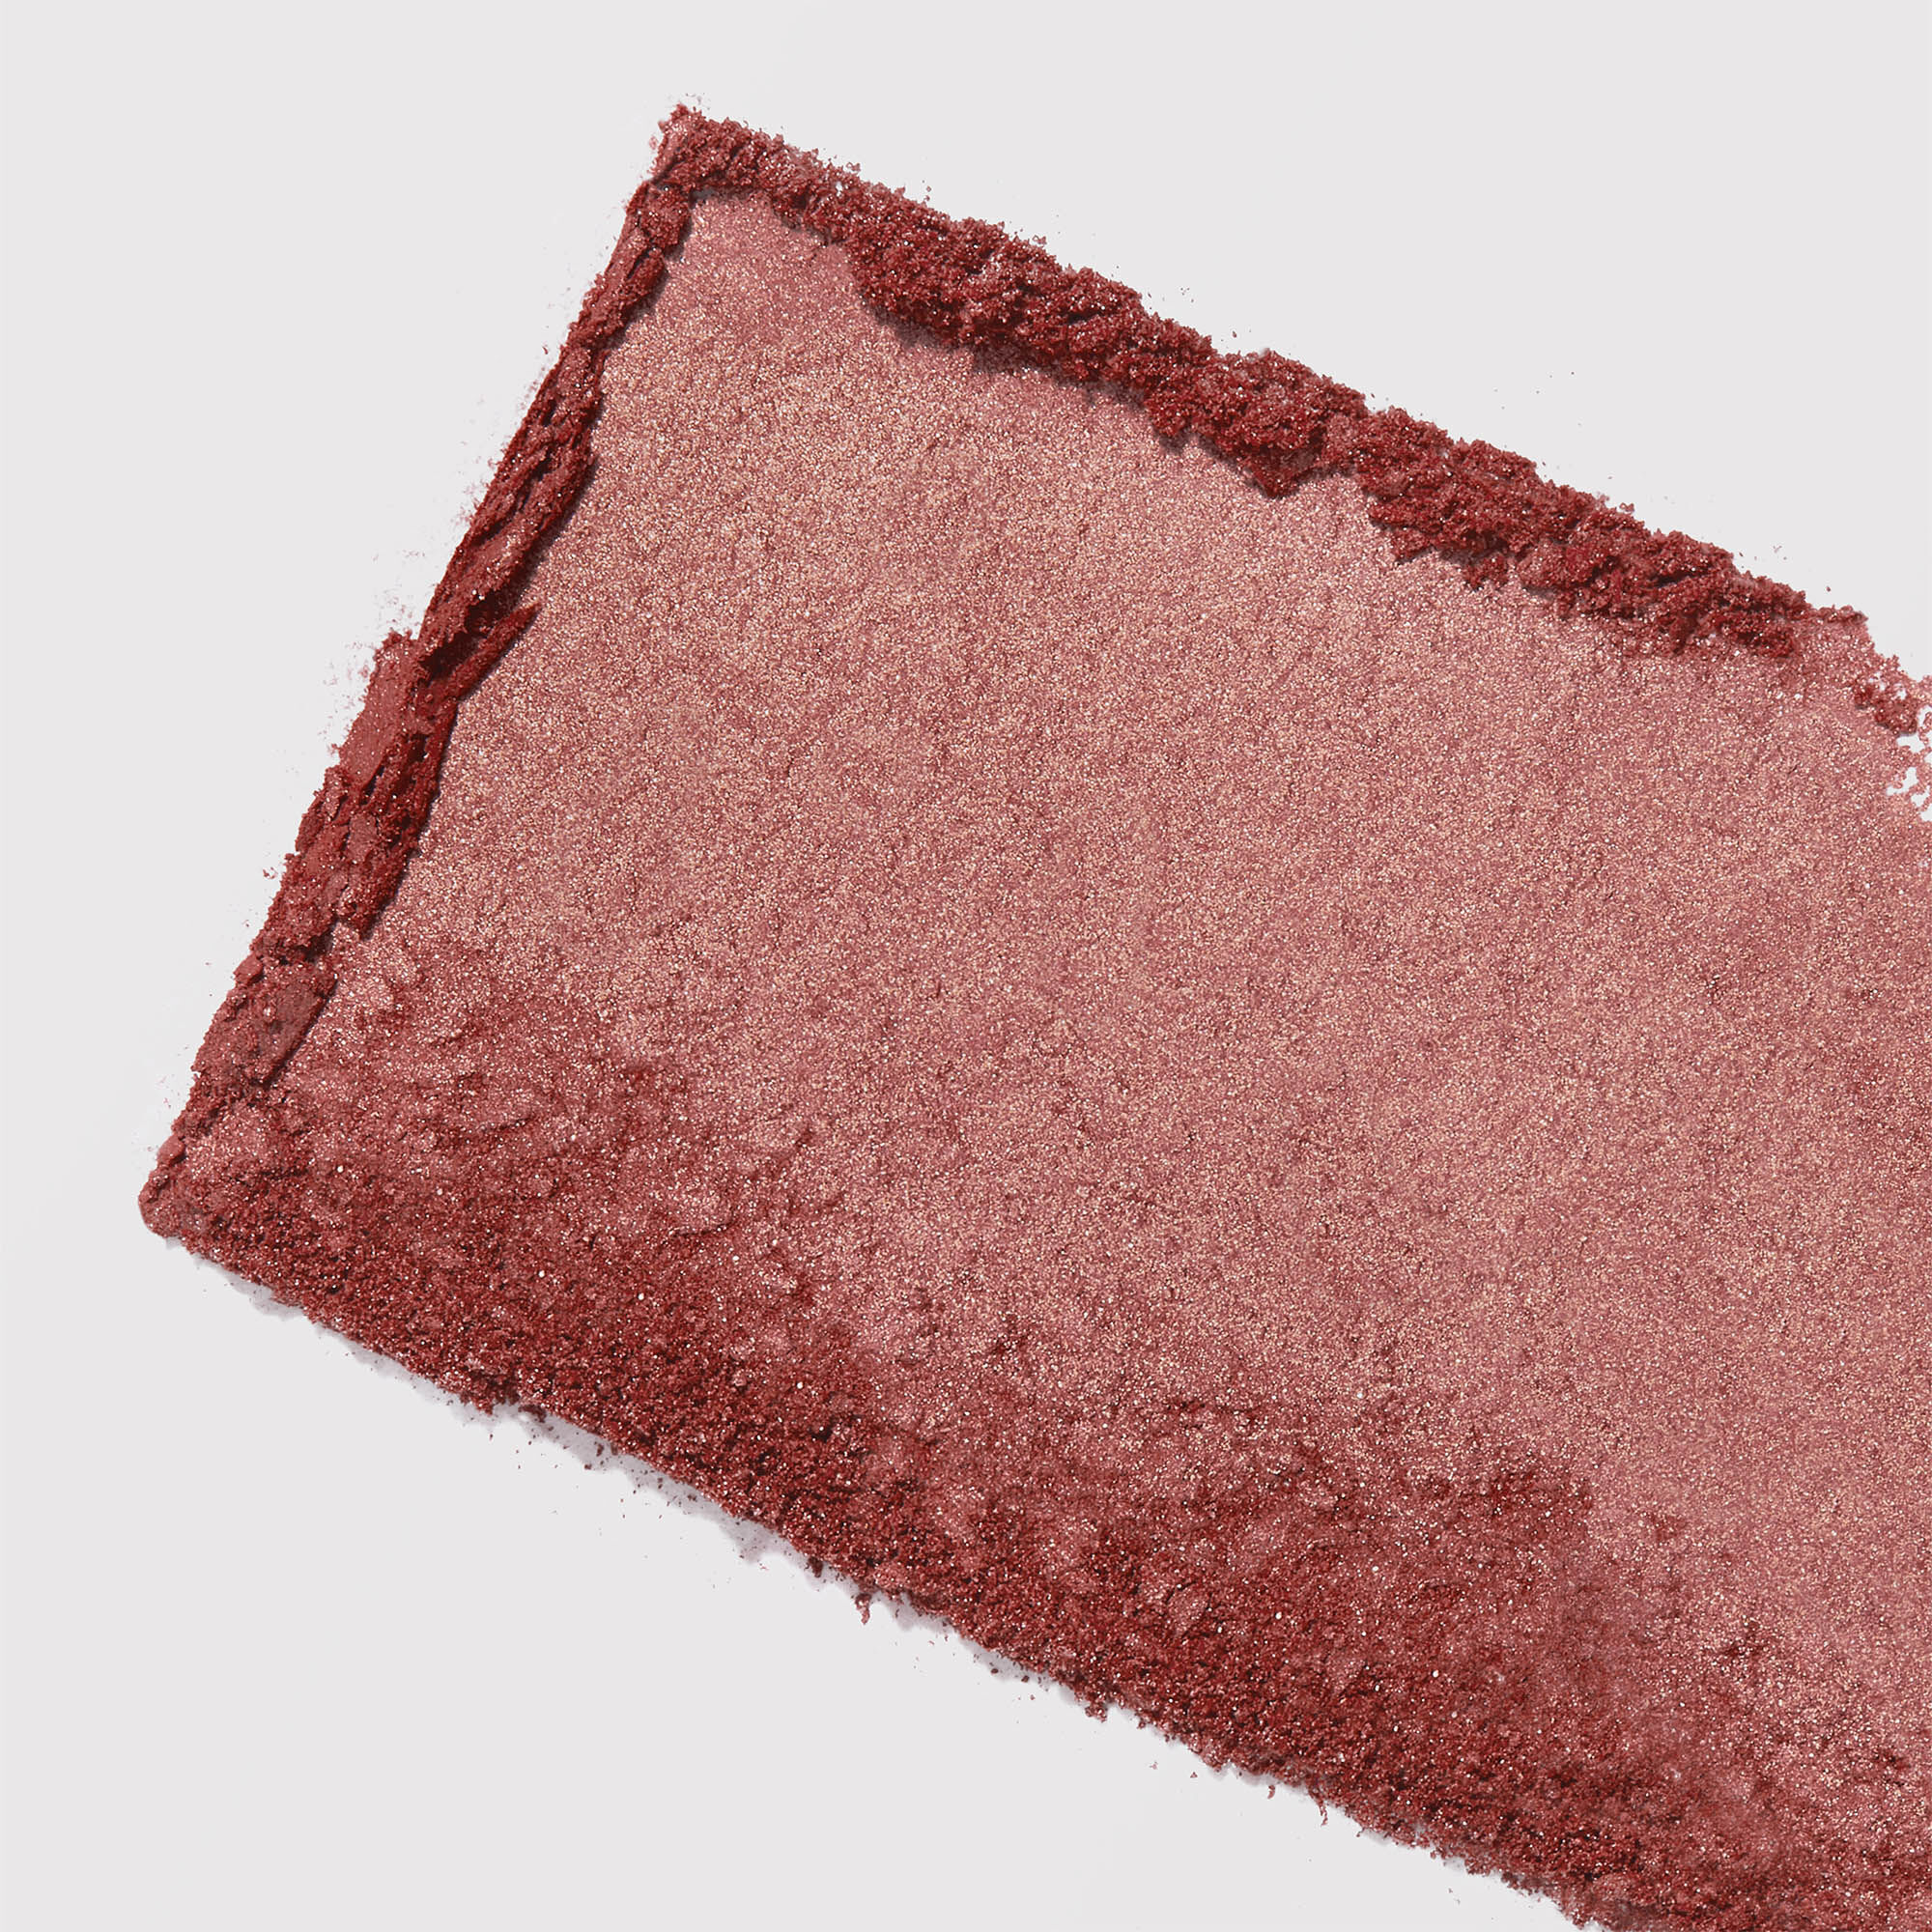 LIT Powder Blush, Frisky